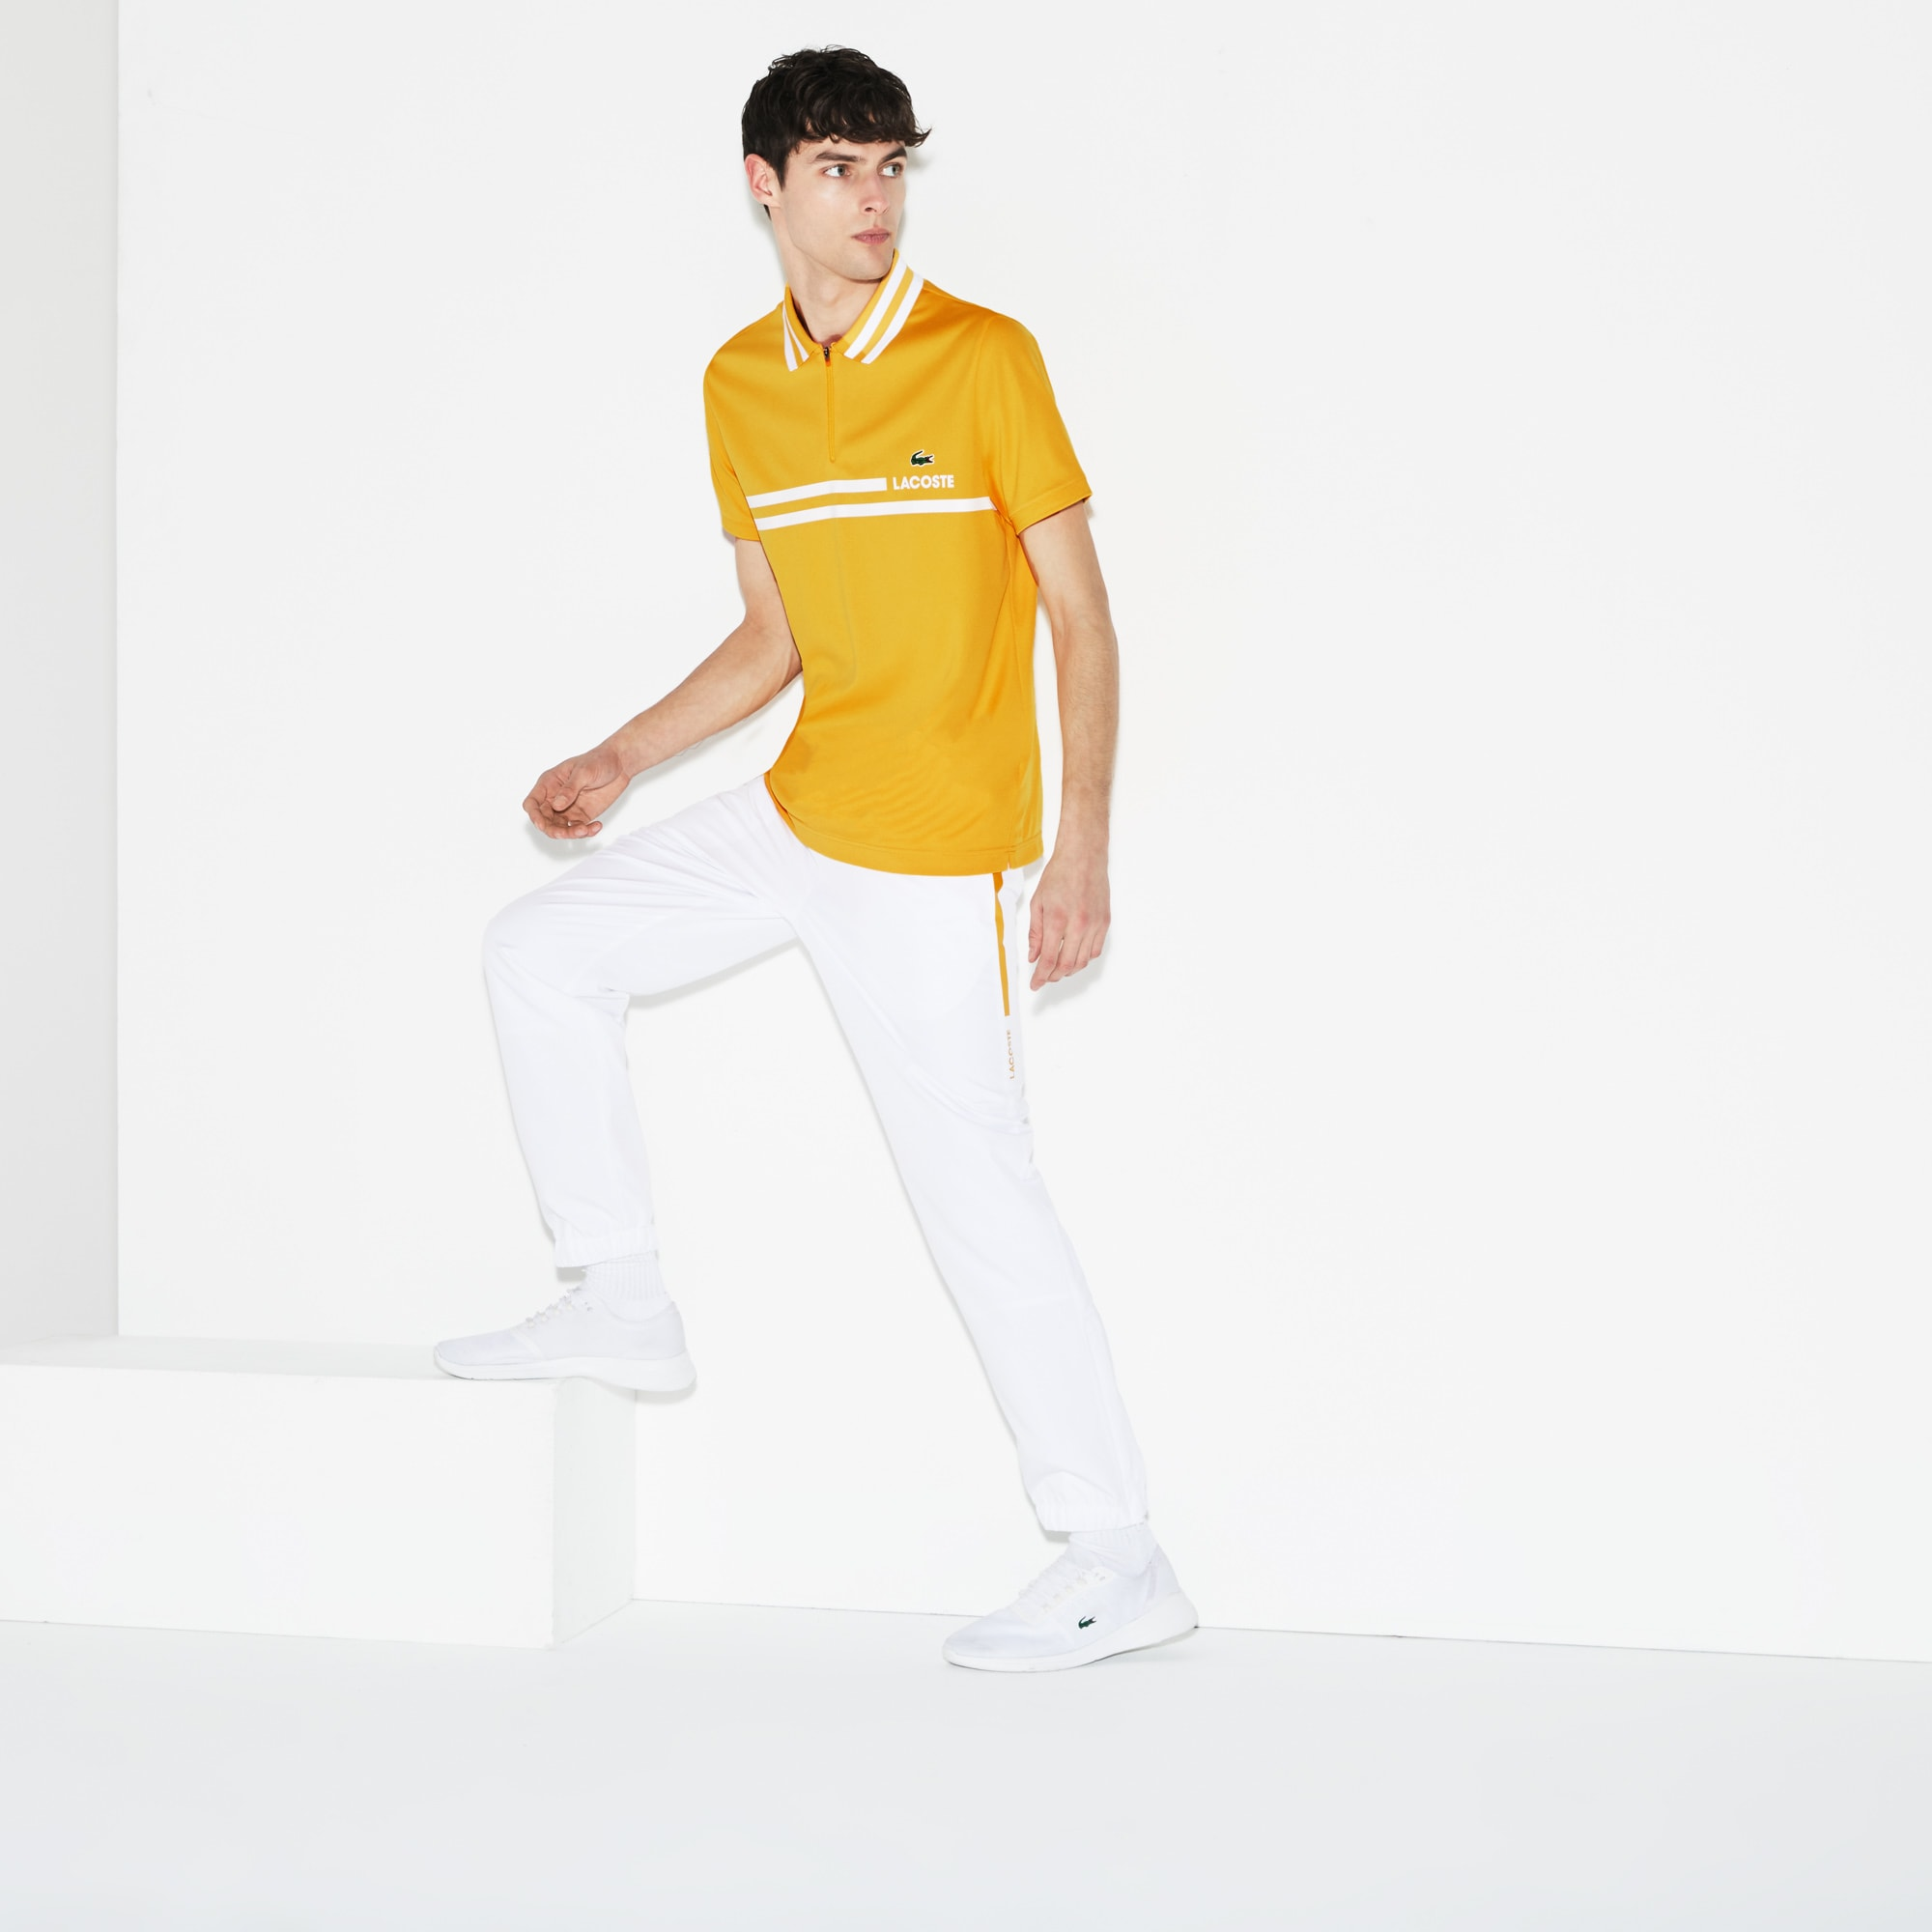 Pantalone tuta Tennis Lacoste SPORT in taffetà